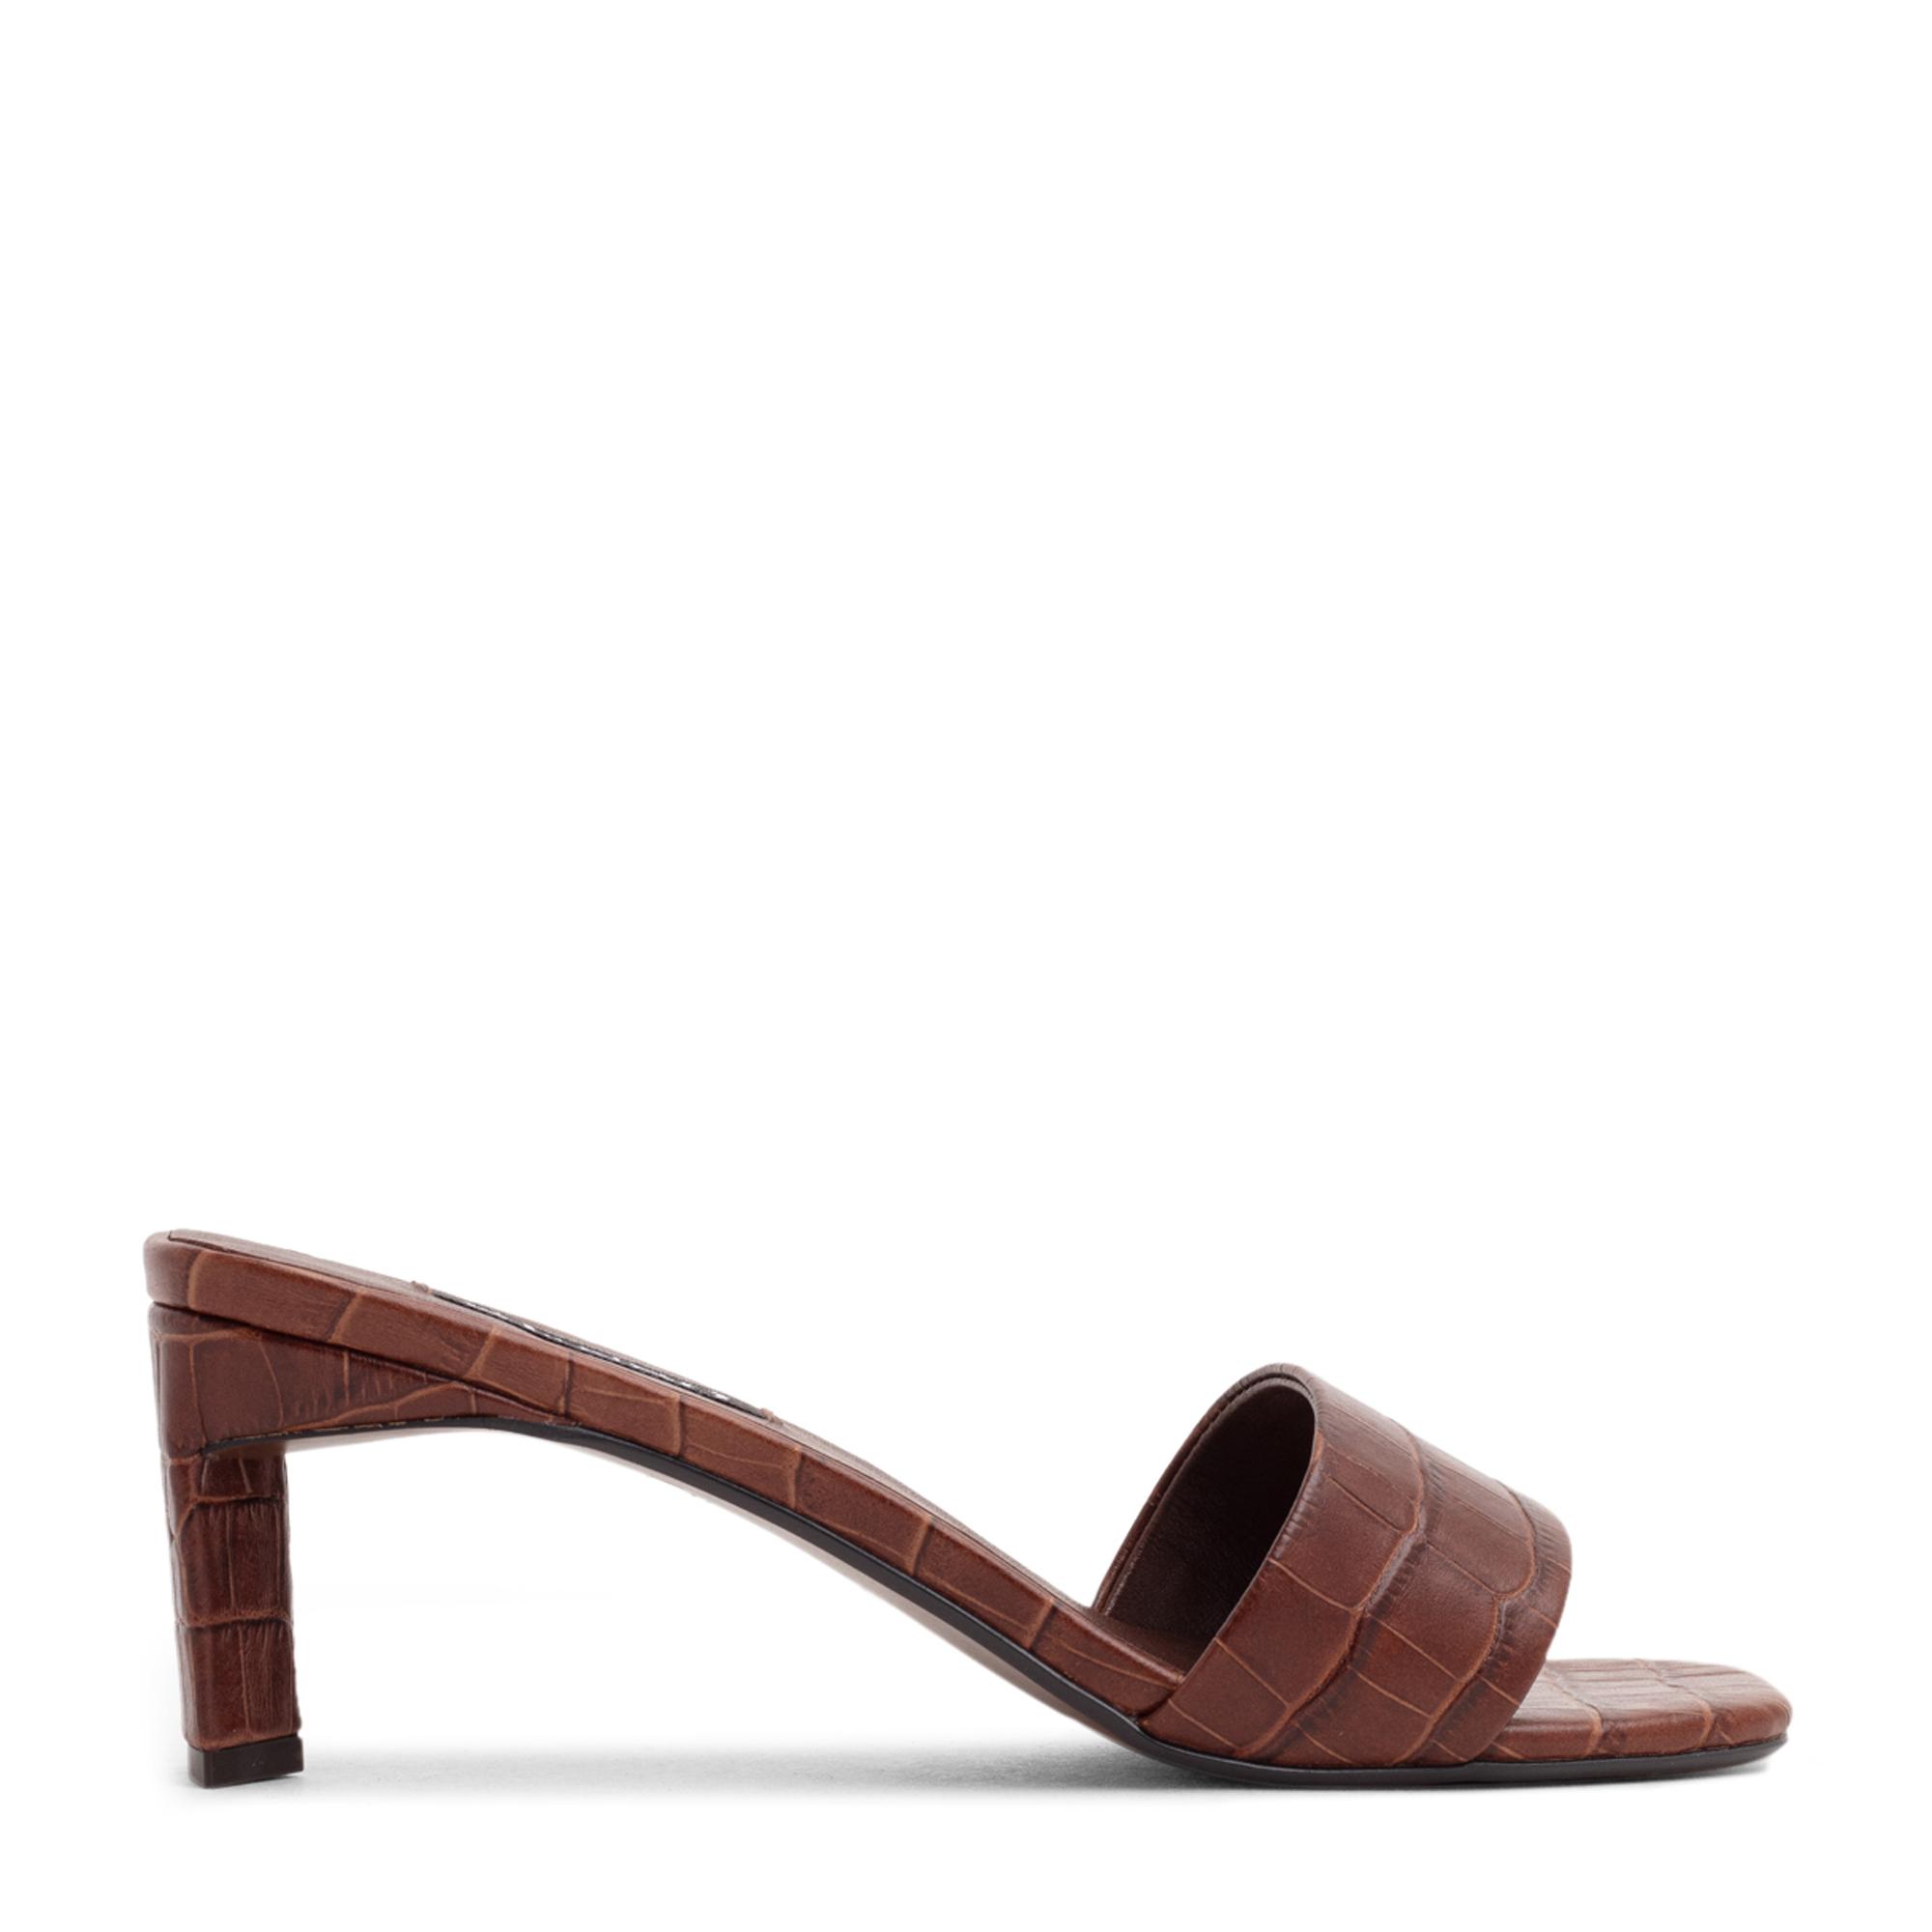 Maisy sandals